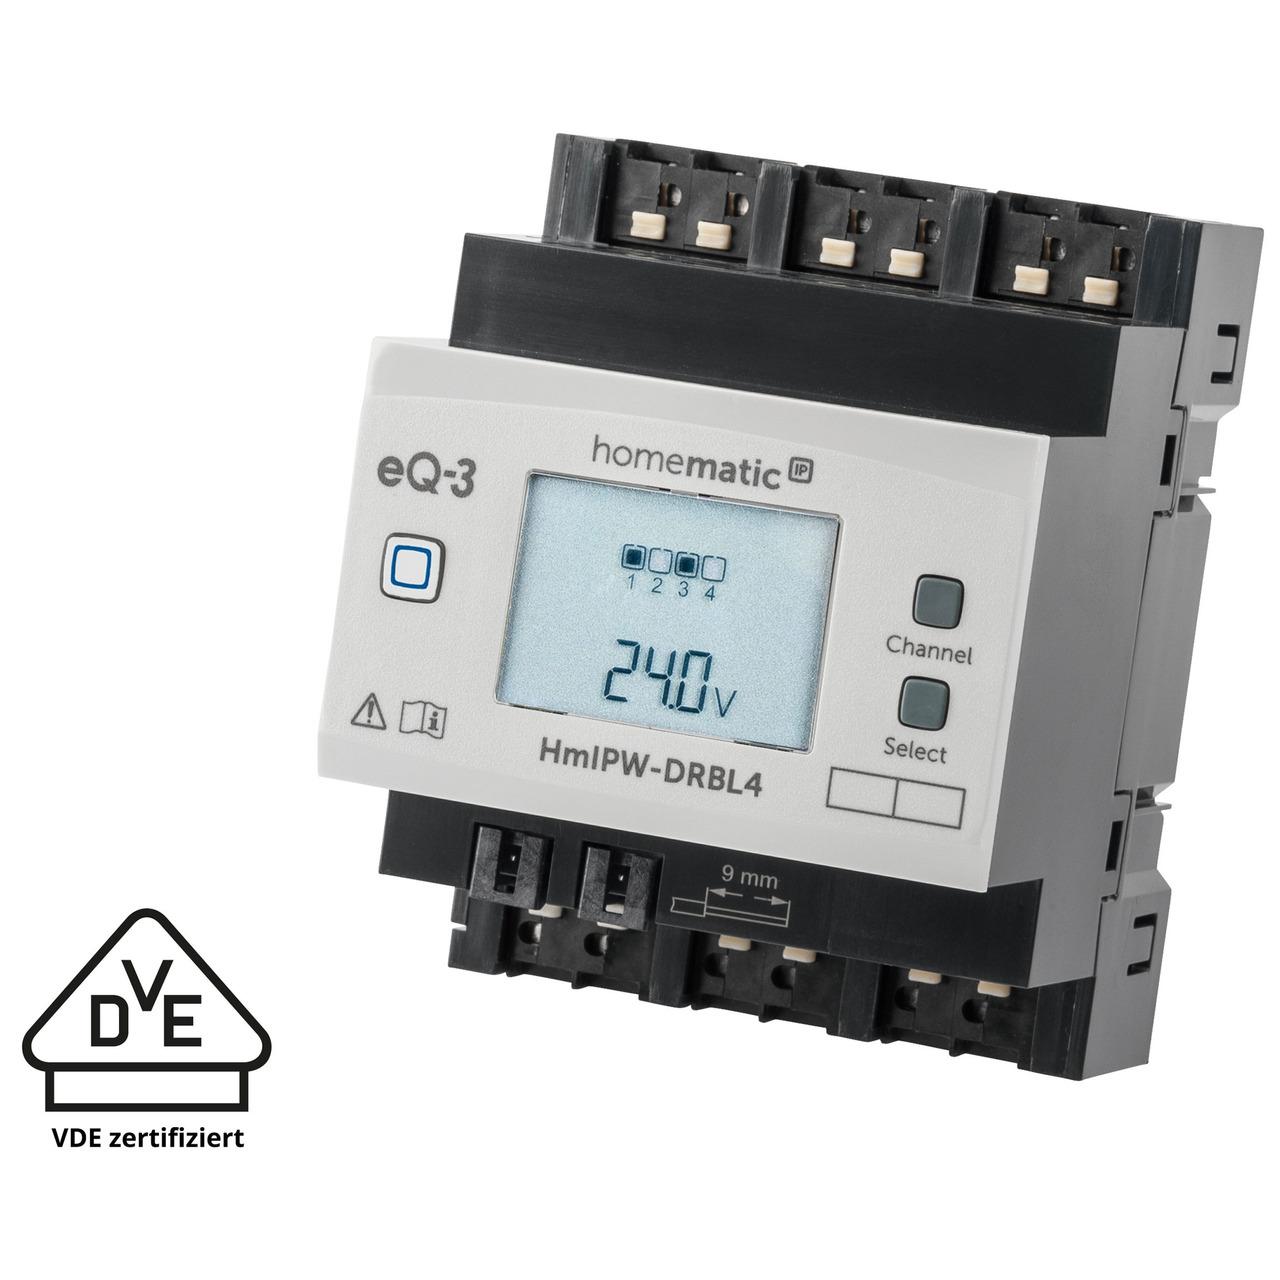 Homematic IP Wired Smart Home 4-fach-Jalousie-/Rollladenaktor HmIPW-DRBL4- VDE zertifiziert